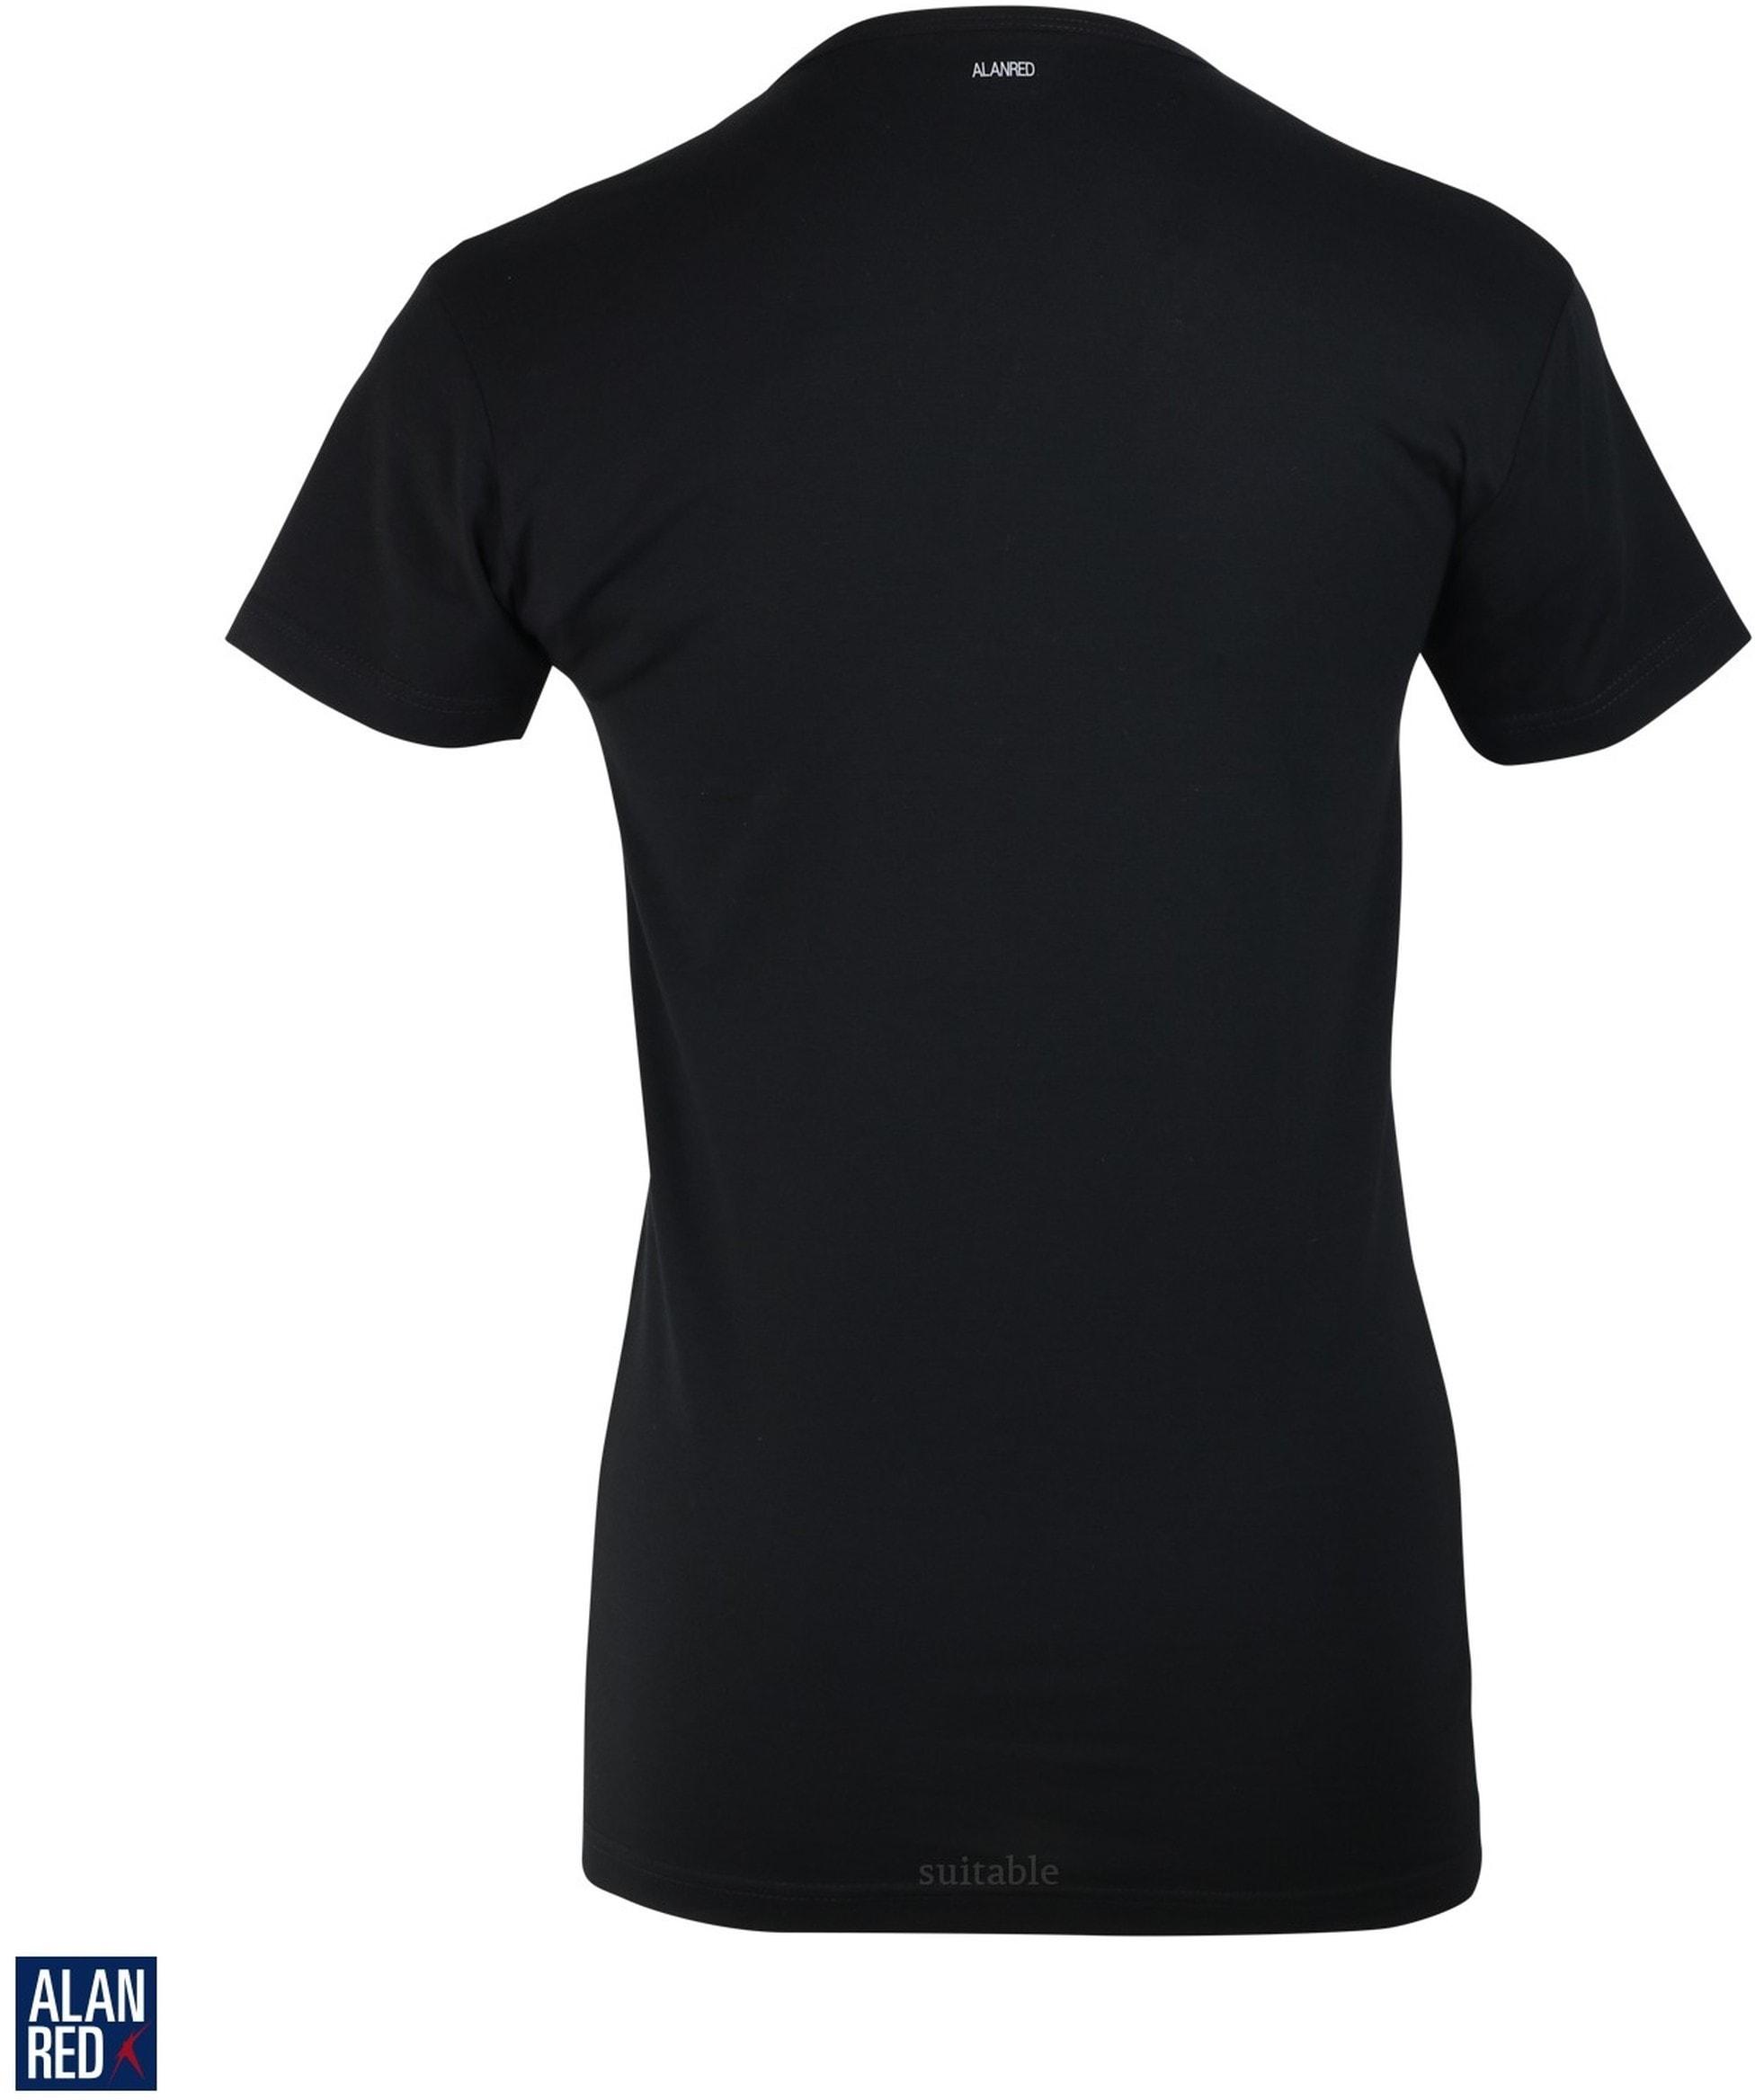 Alan Red Oklahoma T-shirt Stretch Zwart (1pack) foto 1